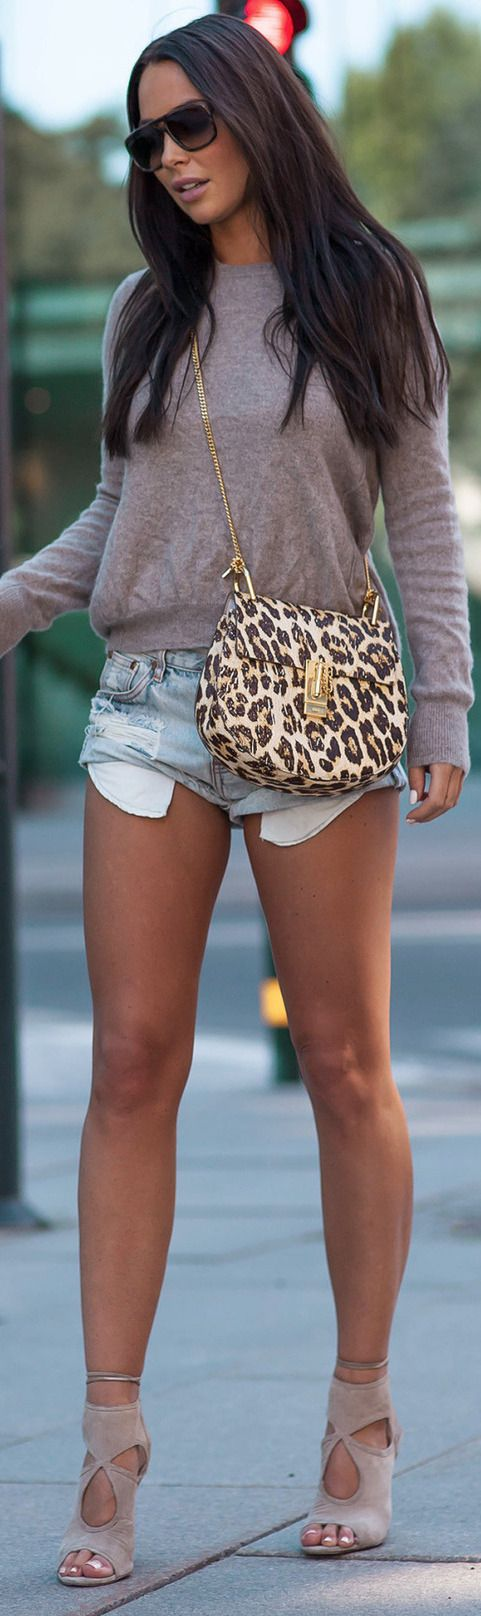 Cashmere Sweater / Fashion By Johanna Olsson